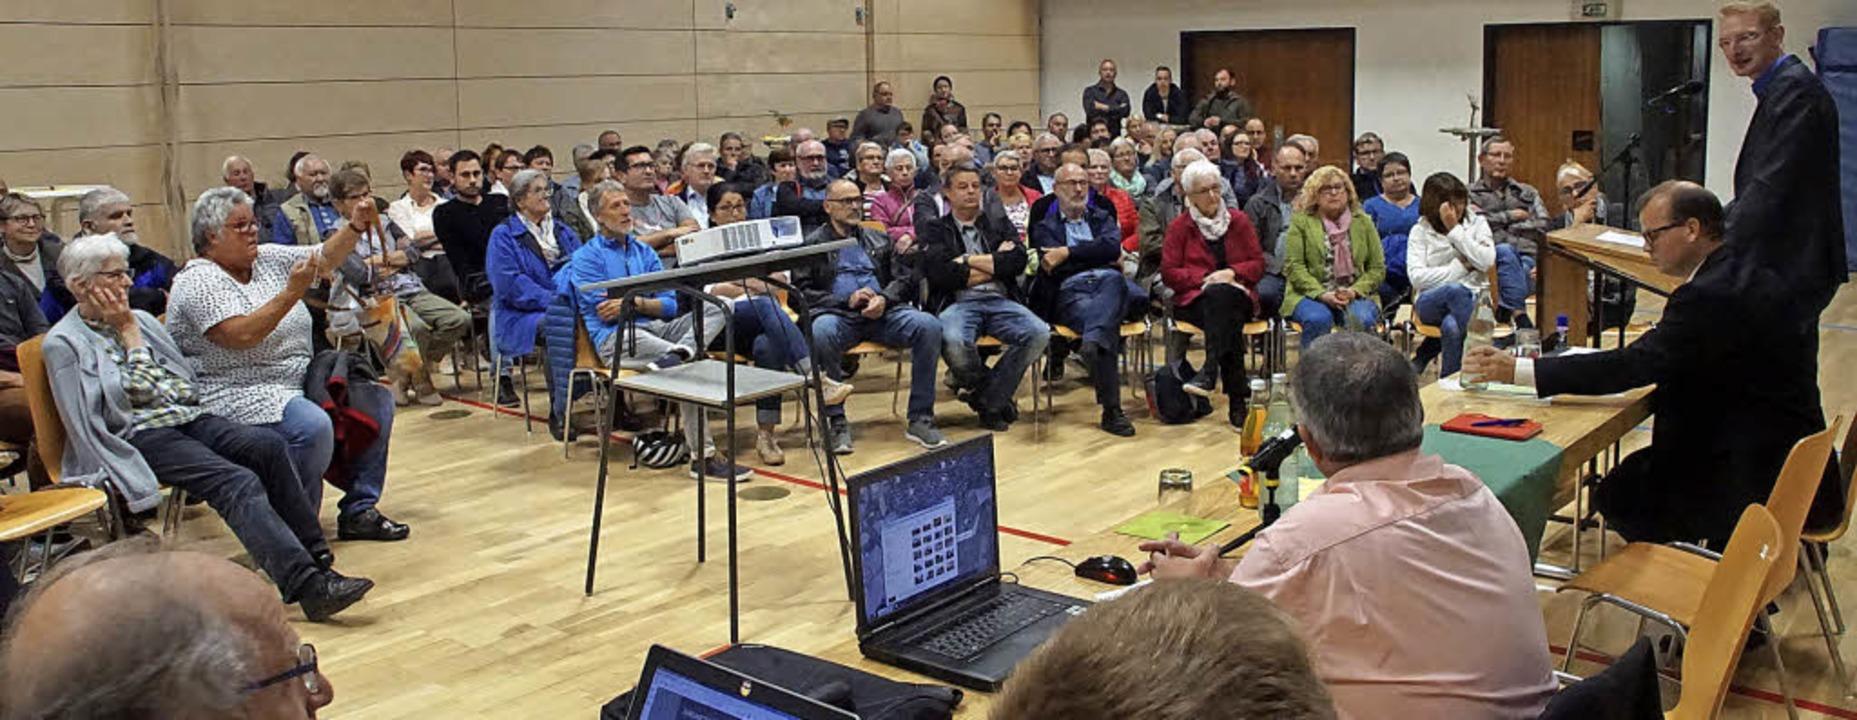 Der Andrang bei der Bürgerversammlung am Mittwoch war groß.   | Foto: Ilona Hüge